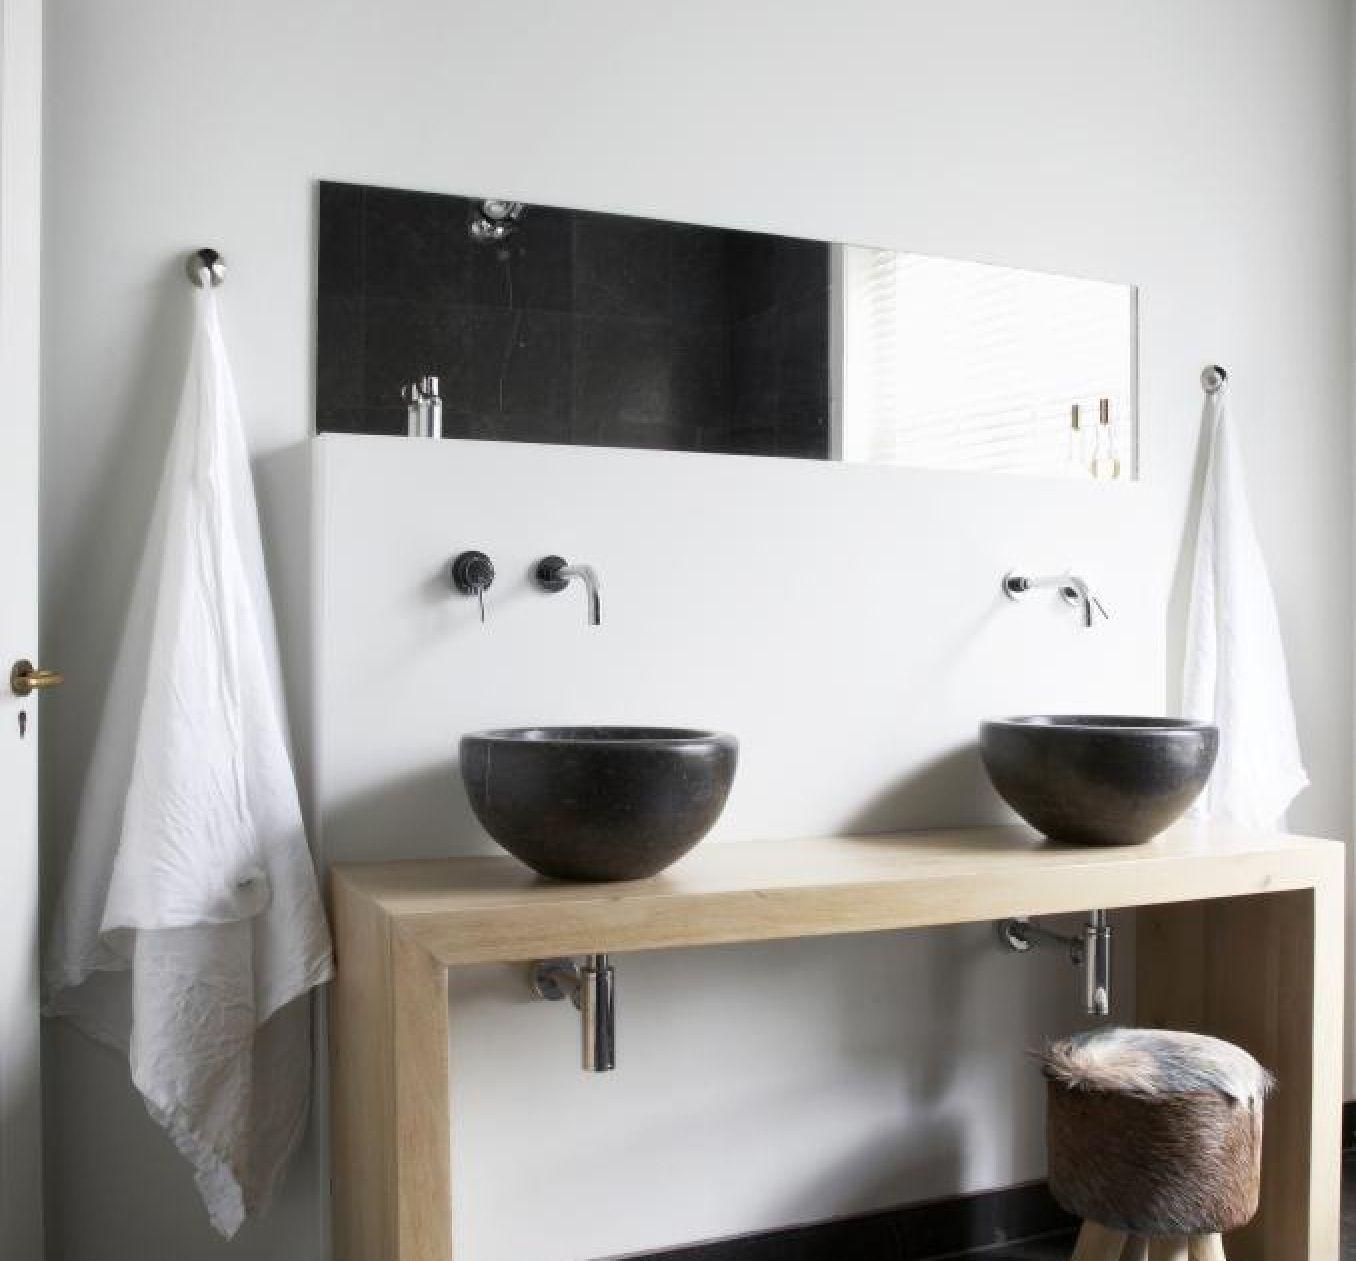 Reforma ba o con lavabos dise o negros sobre encimera de for Grifo lavabo